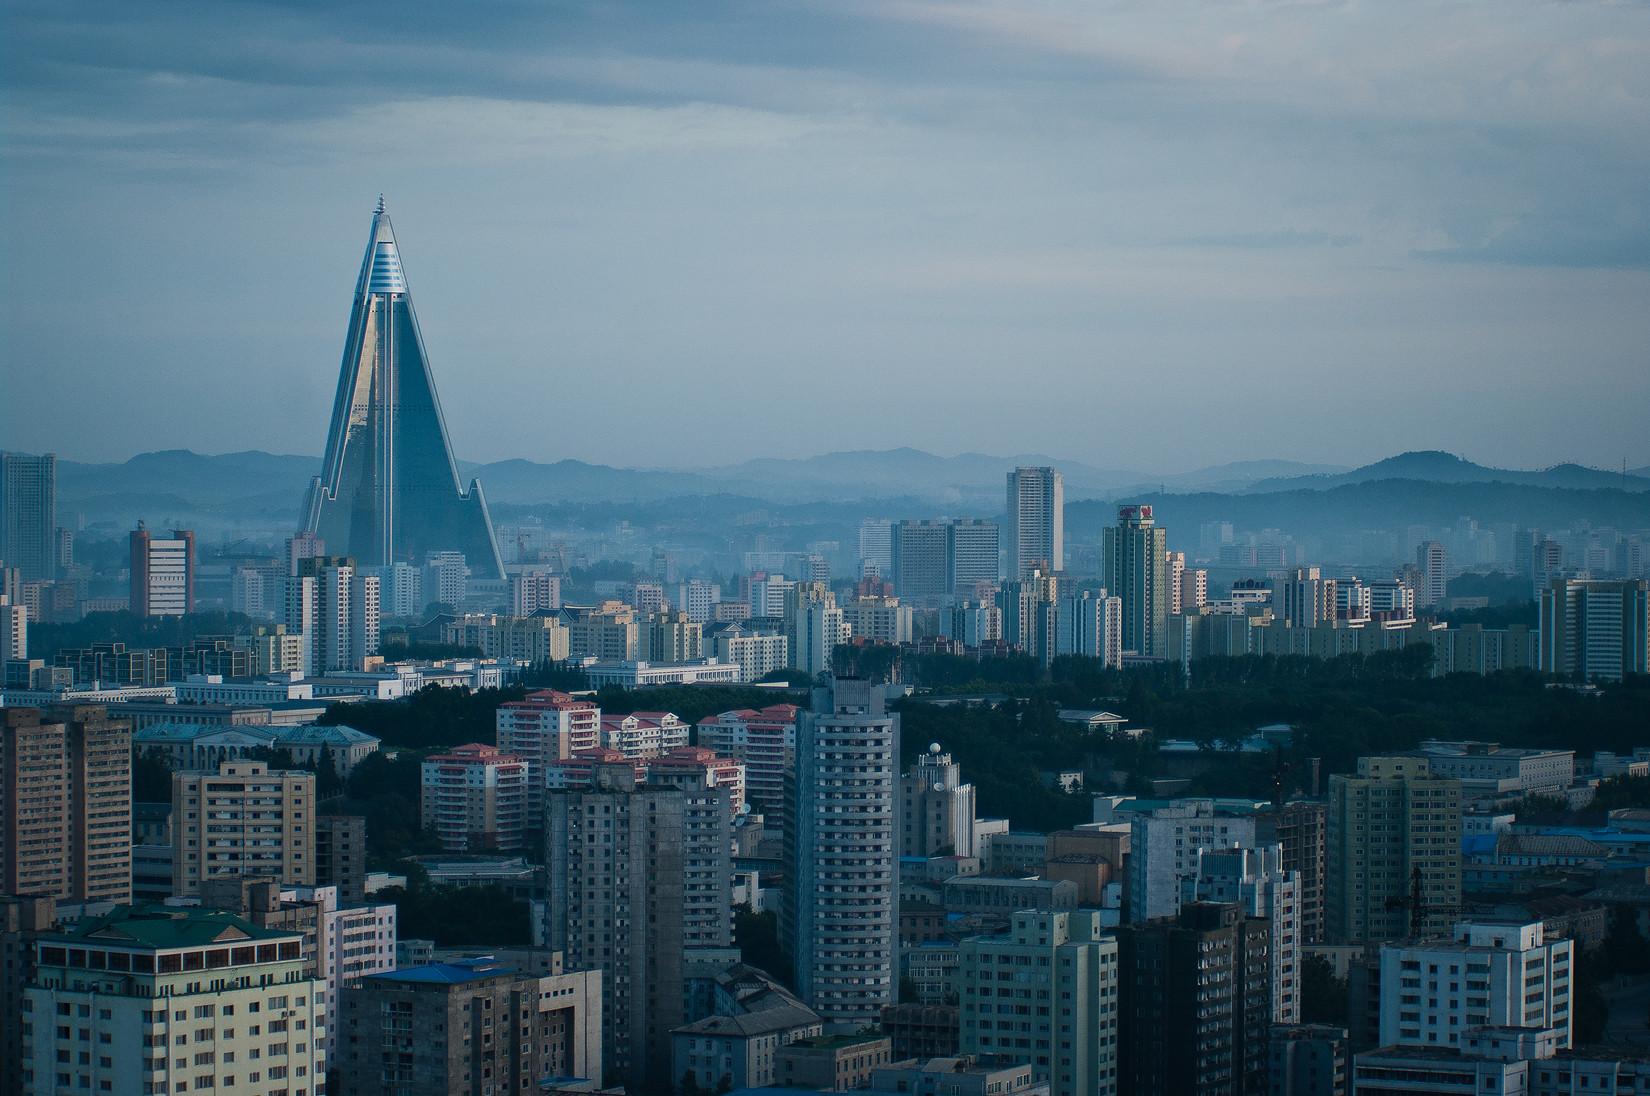 Funny Fall Wallpaper Ryugyong Hotel Pyongyang North Korea Thought Rot